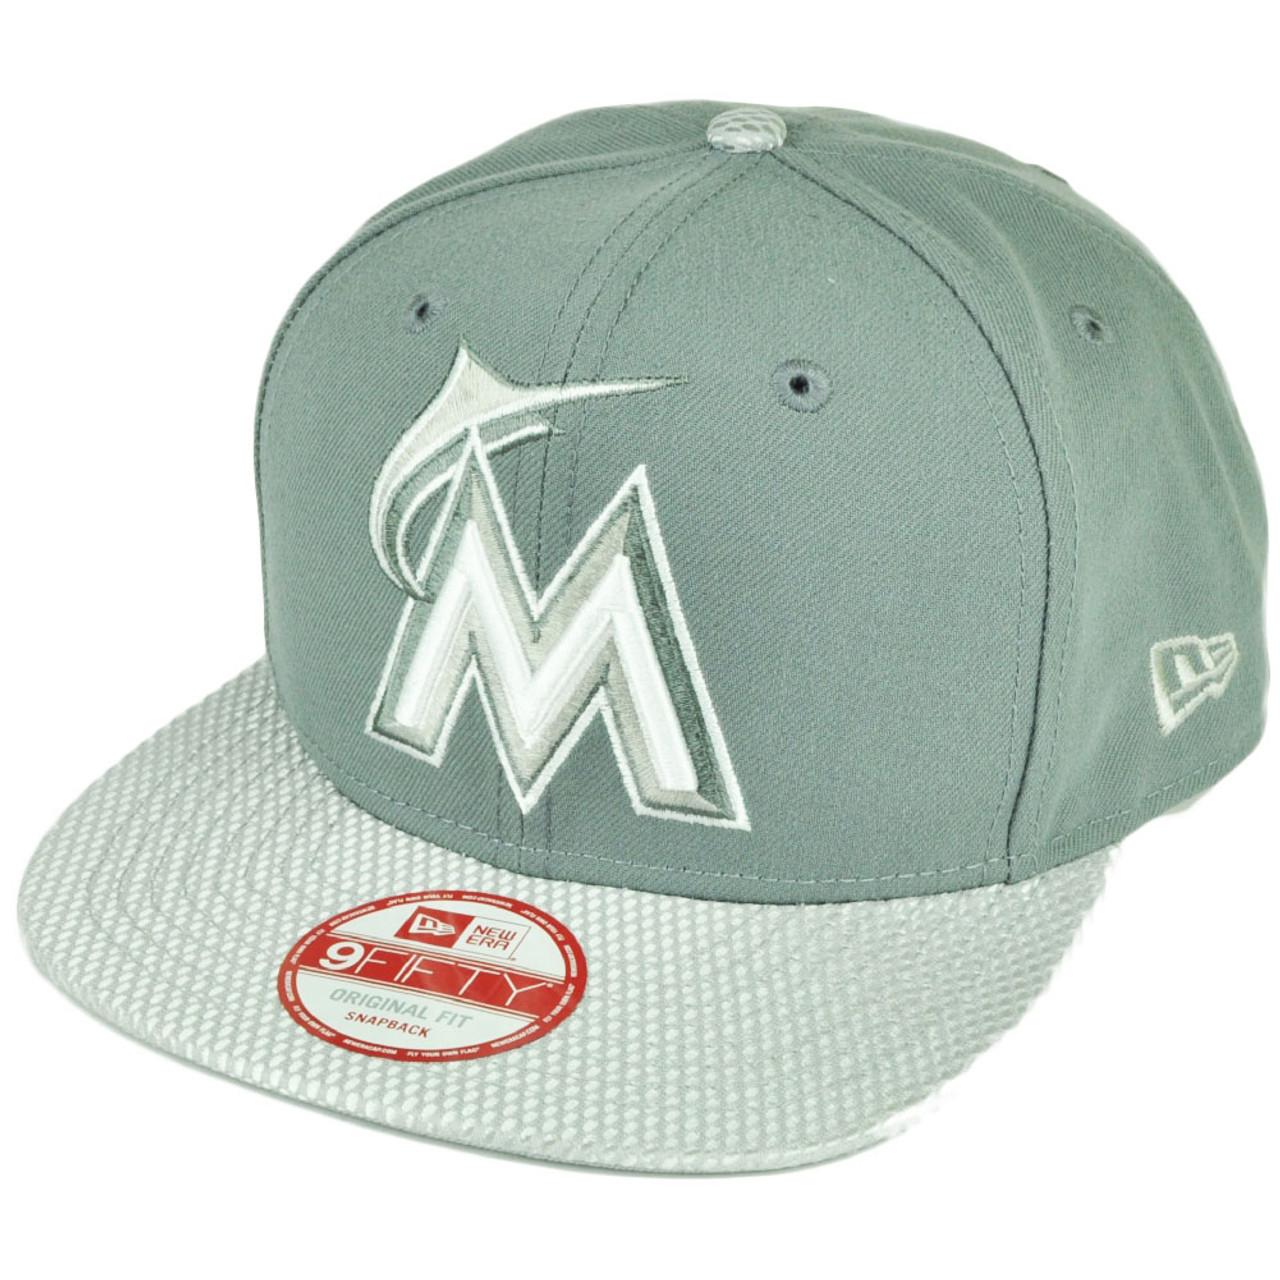 watch 5c57e abe5d MLB New Era 9Fifty Flash Vize Miami Marlins Snapback Hat Cap Flat Bill Gray  - Sinbad Sports Store